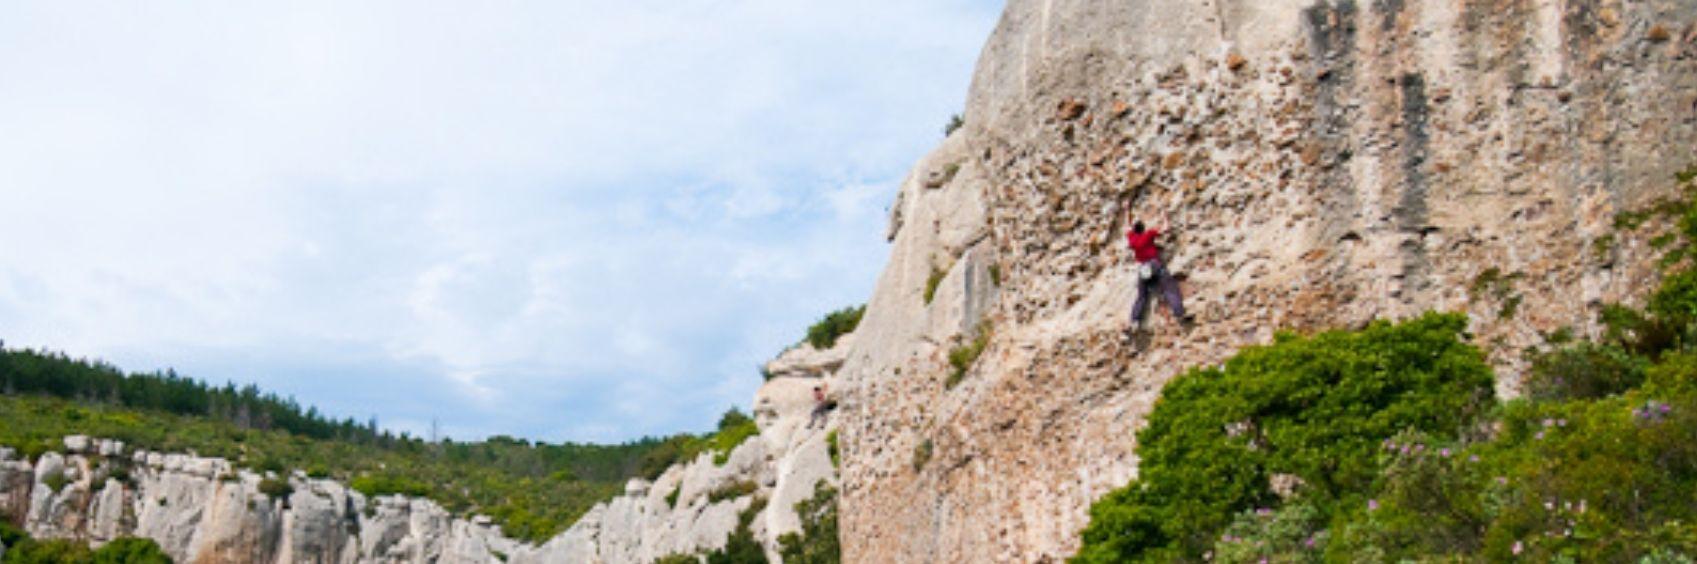 Escalade au Sémaphore Cap Canaille Calanques Cassis La Ciotat Marseille